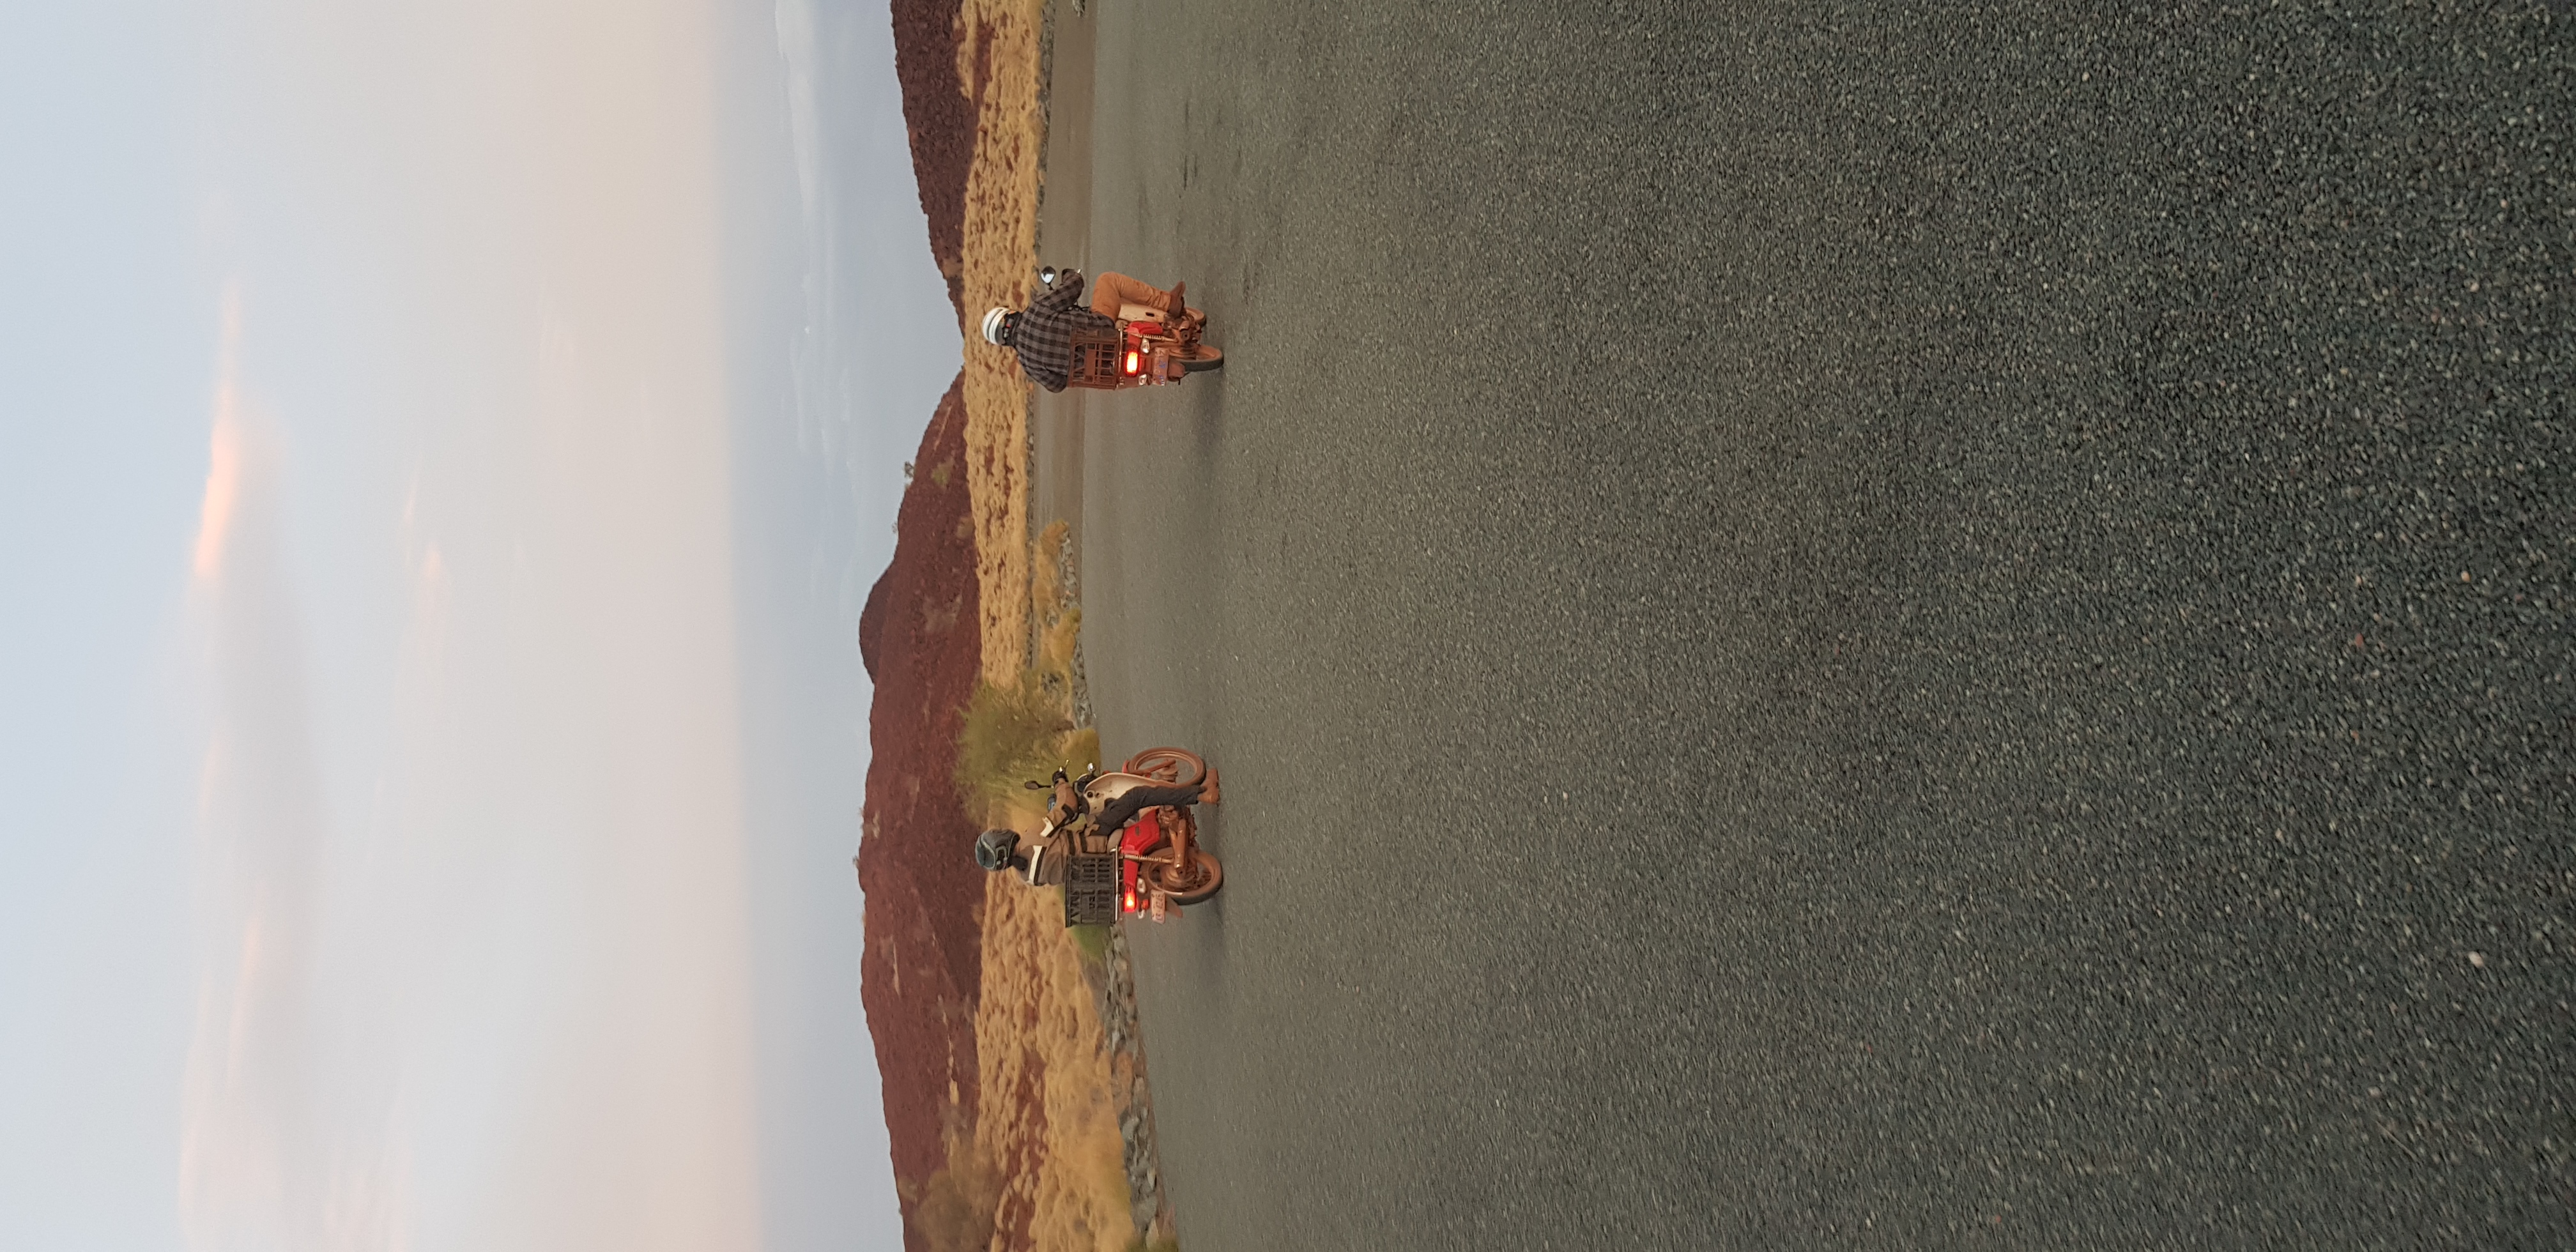 Postie Bike Adventures Australia - P